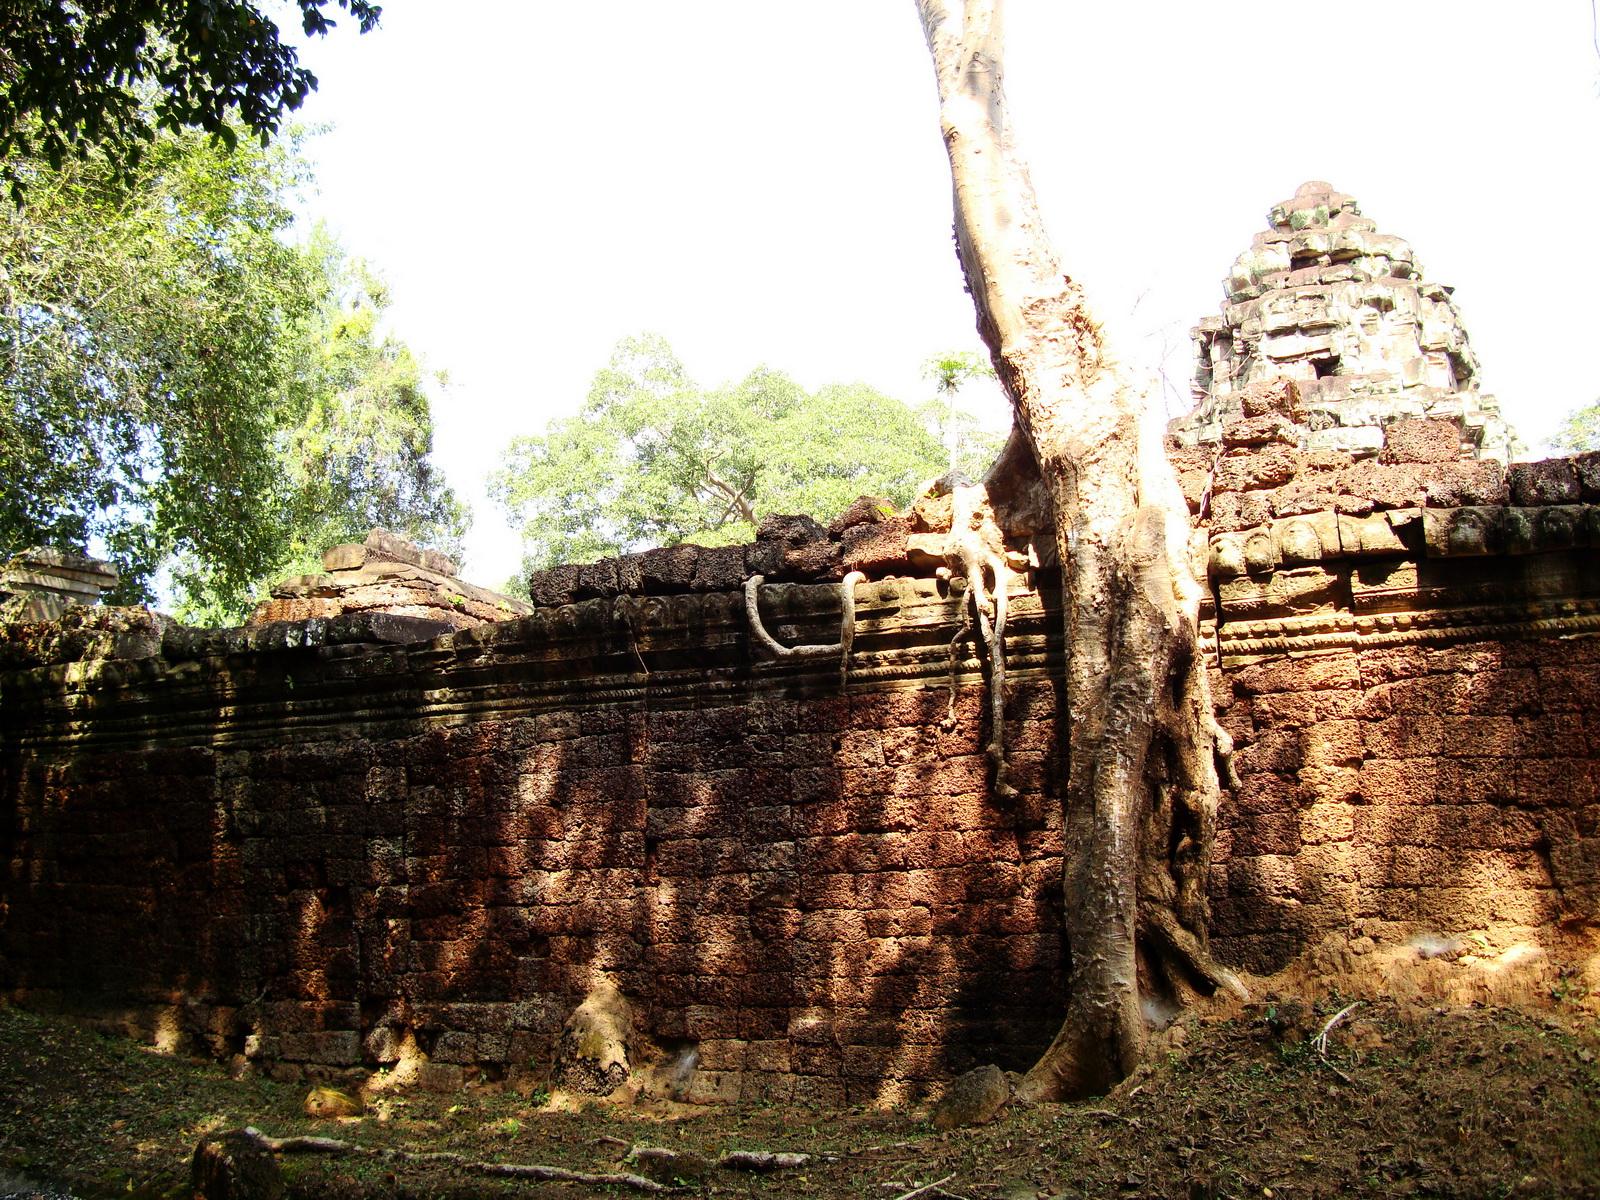 Preah Khan Temple laterite walls overtaken by giant strangler fig trees 08